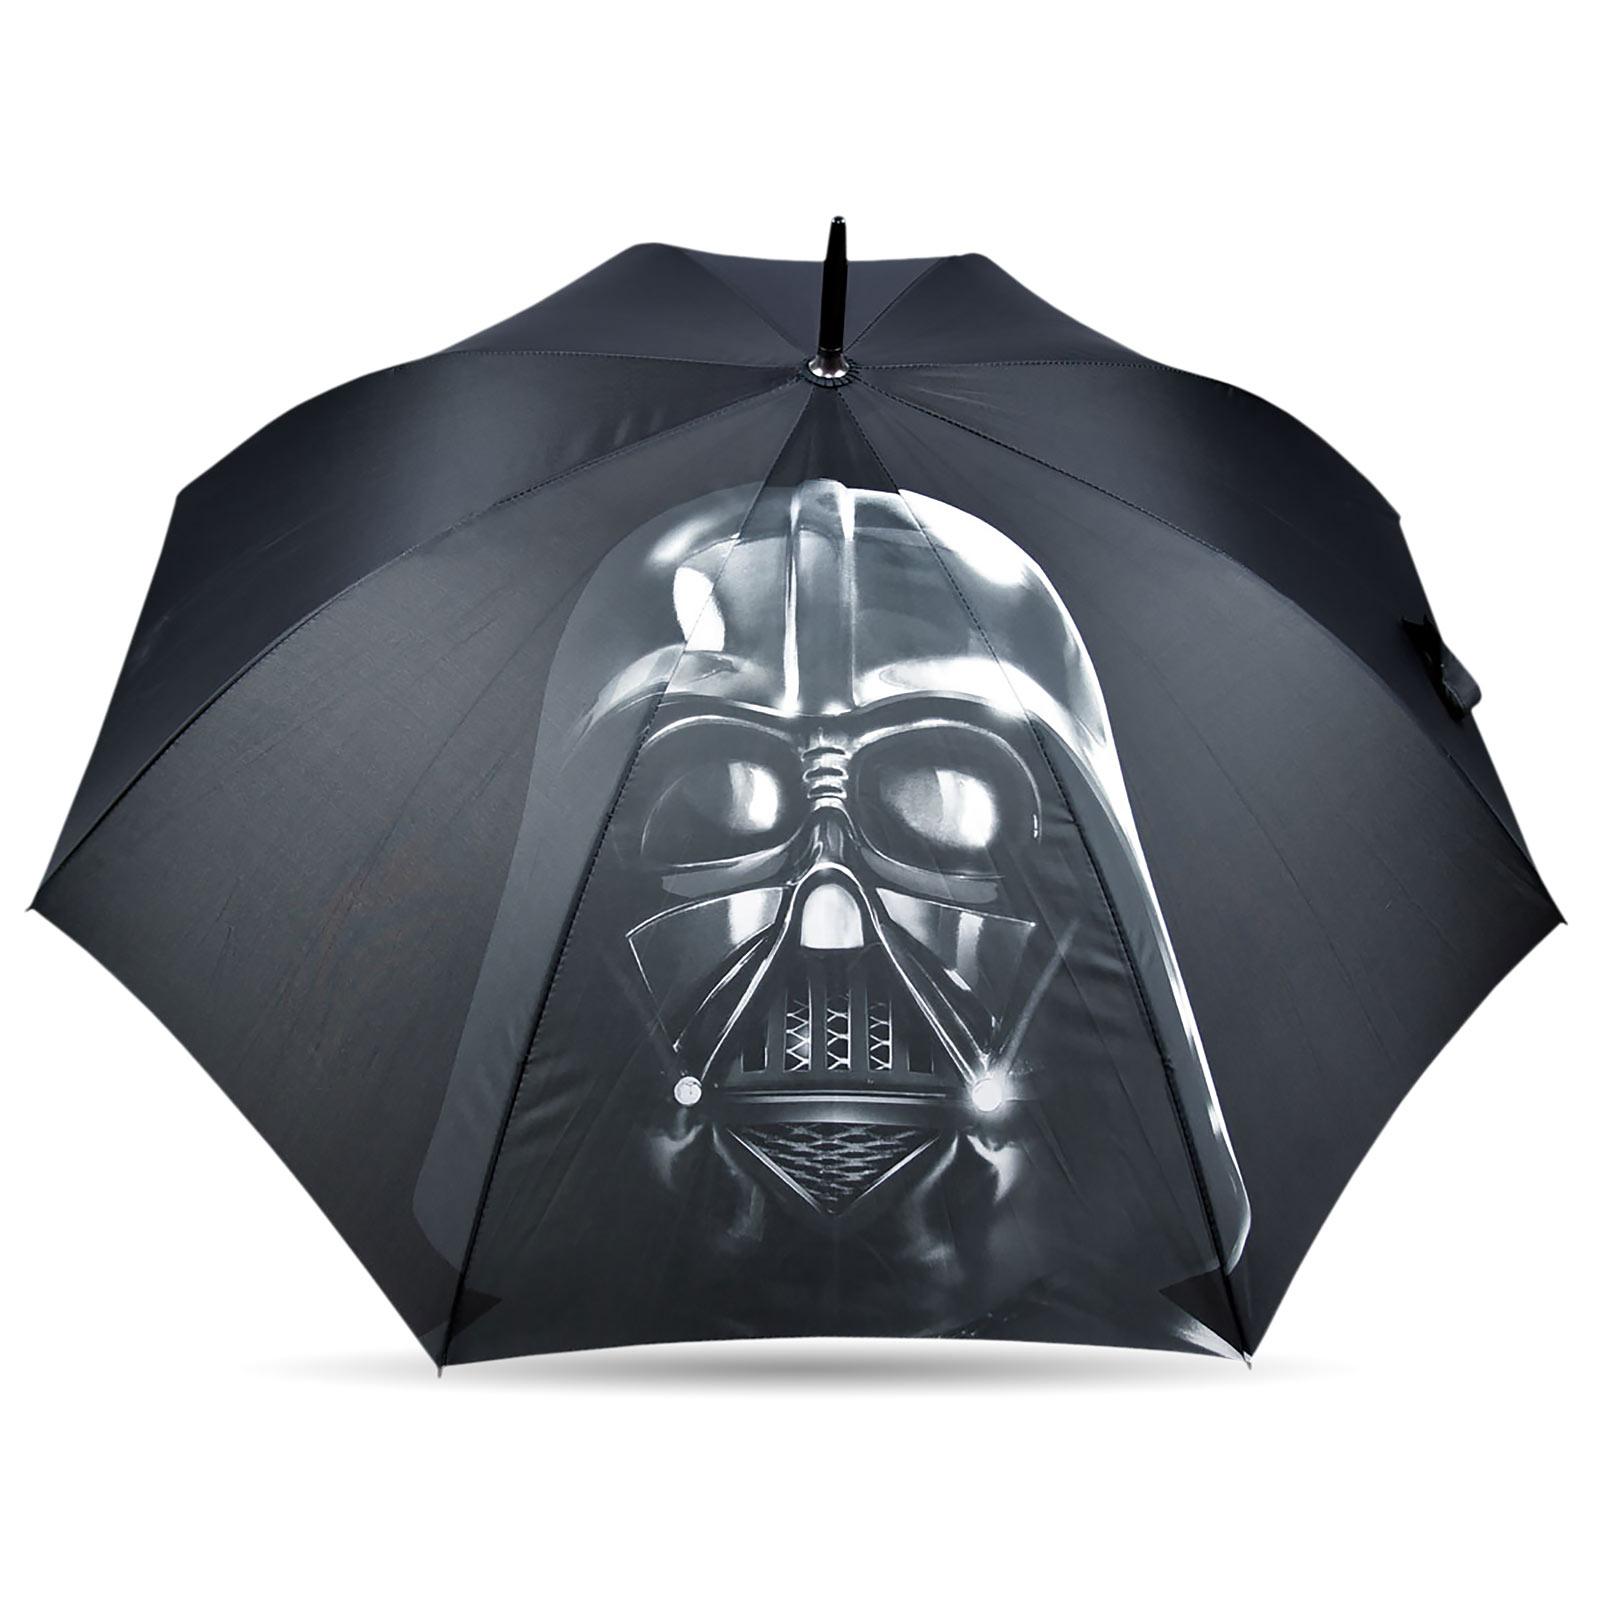 Star Wars - Darth Vader Schirm